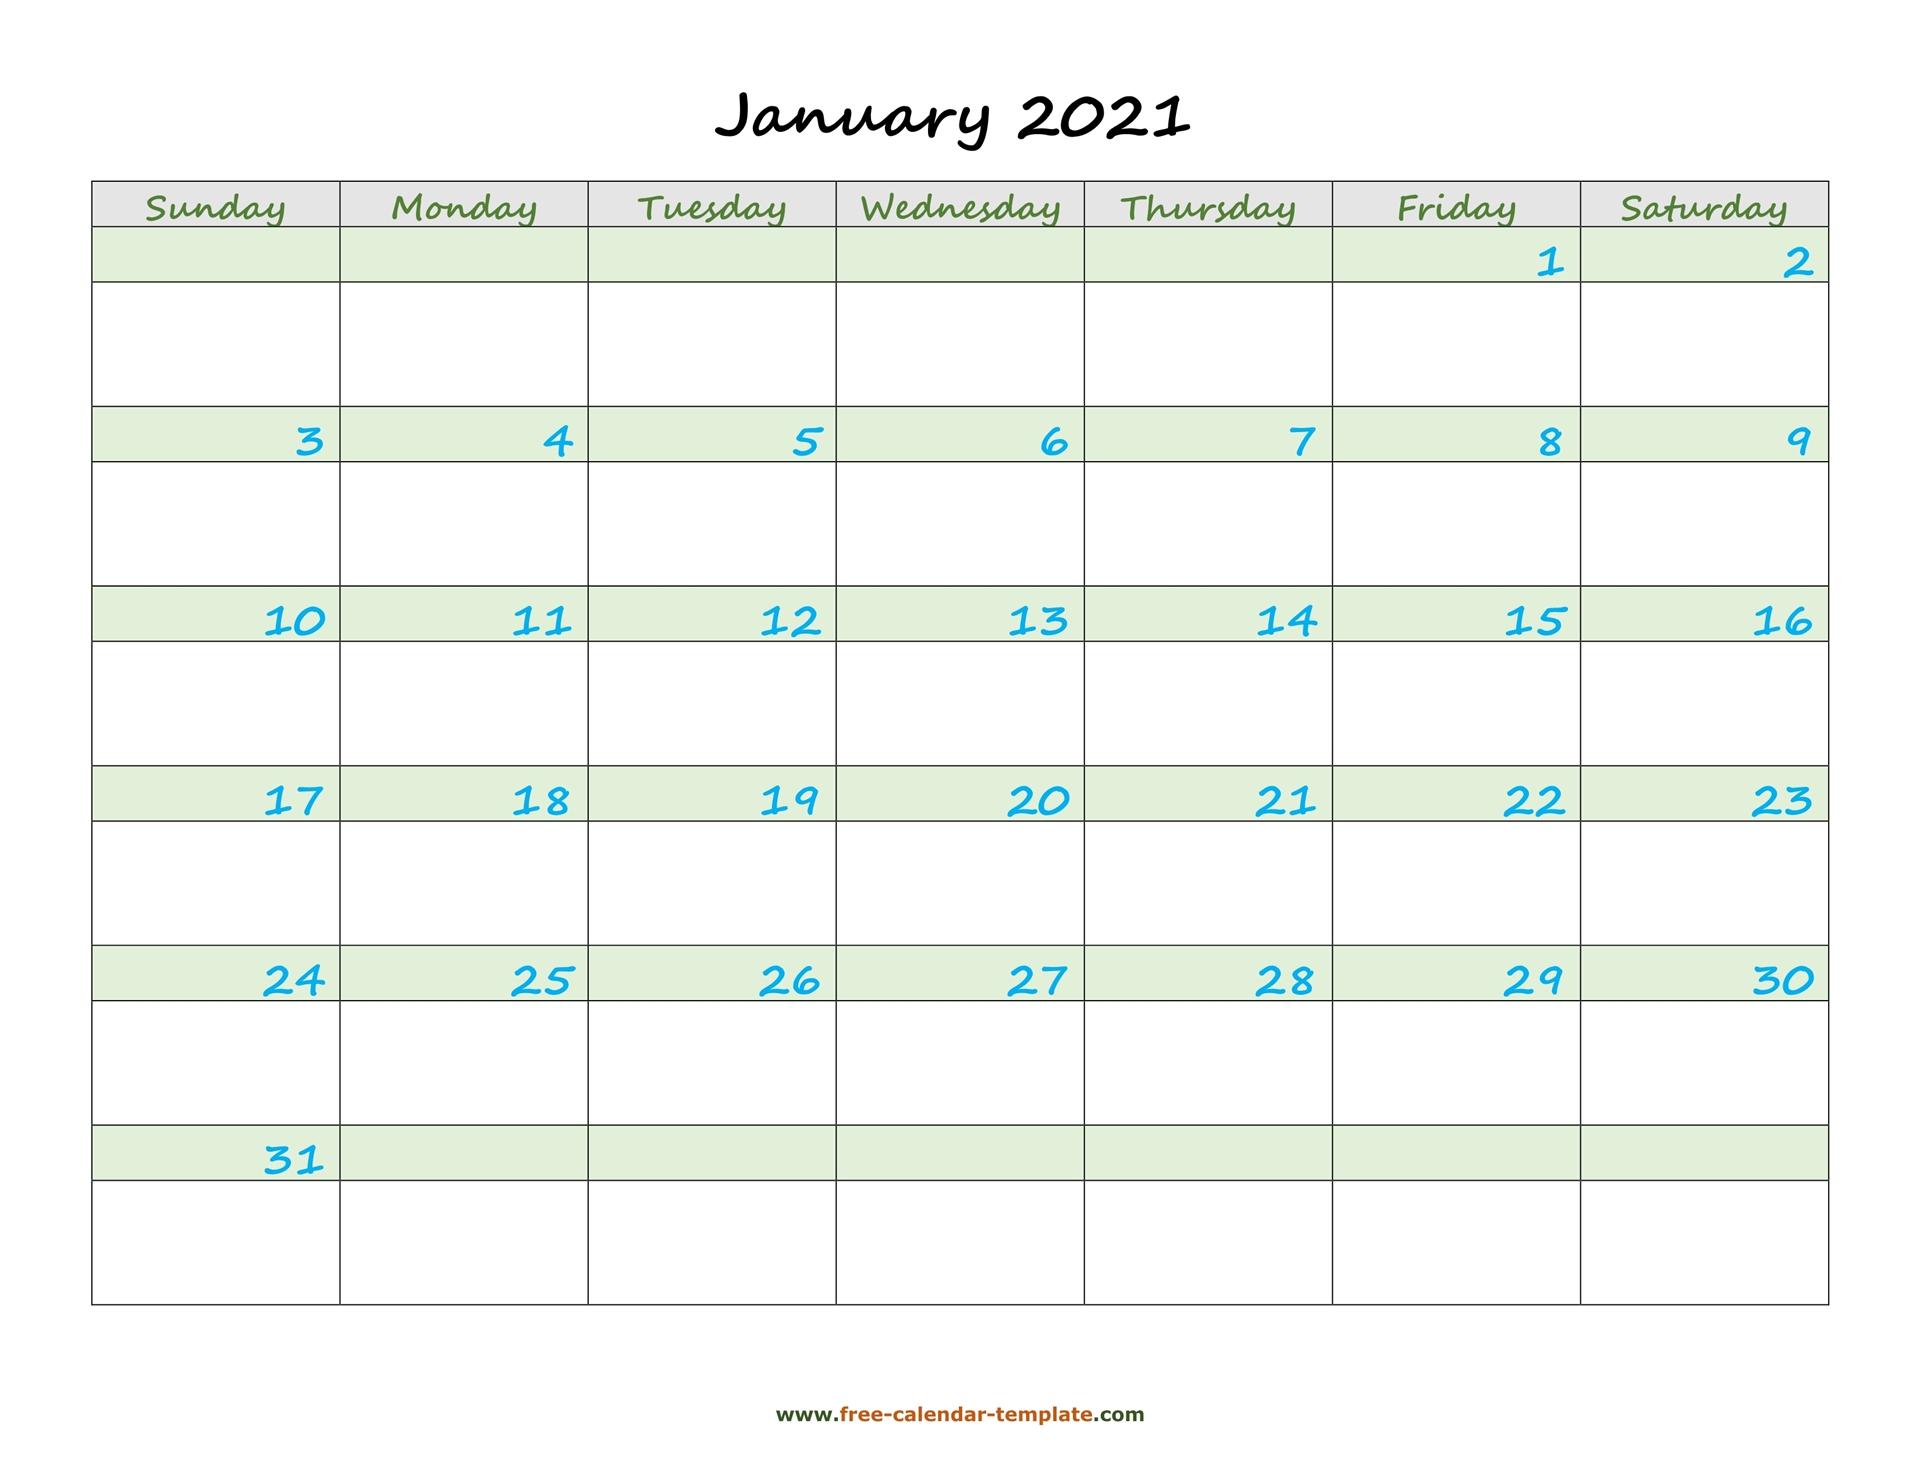 January 2021 Free Calendar Tempplate Free Calendar 1